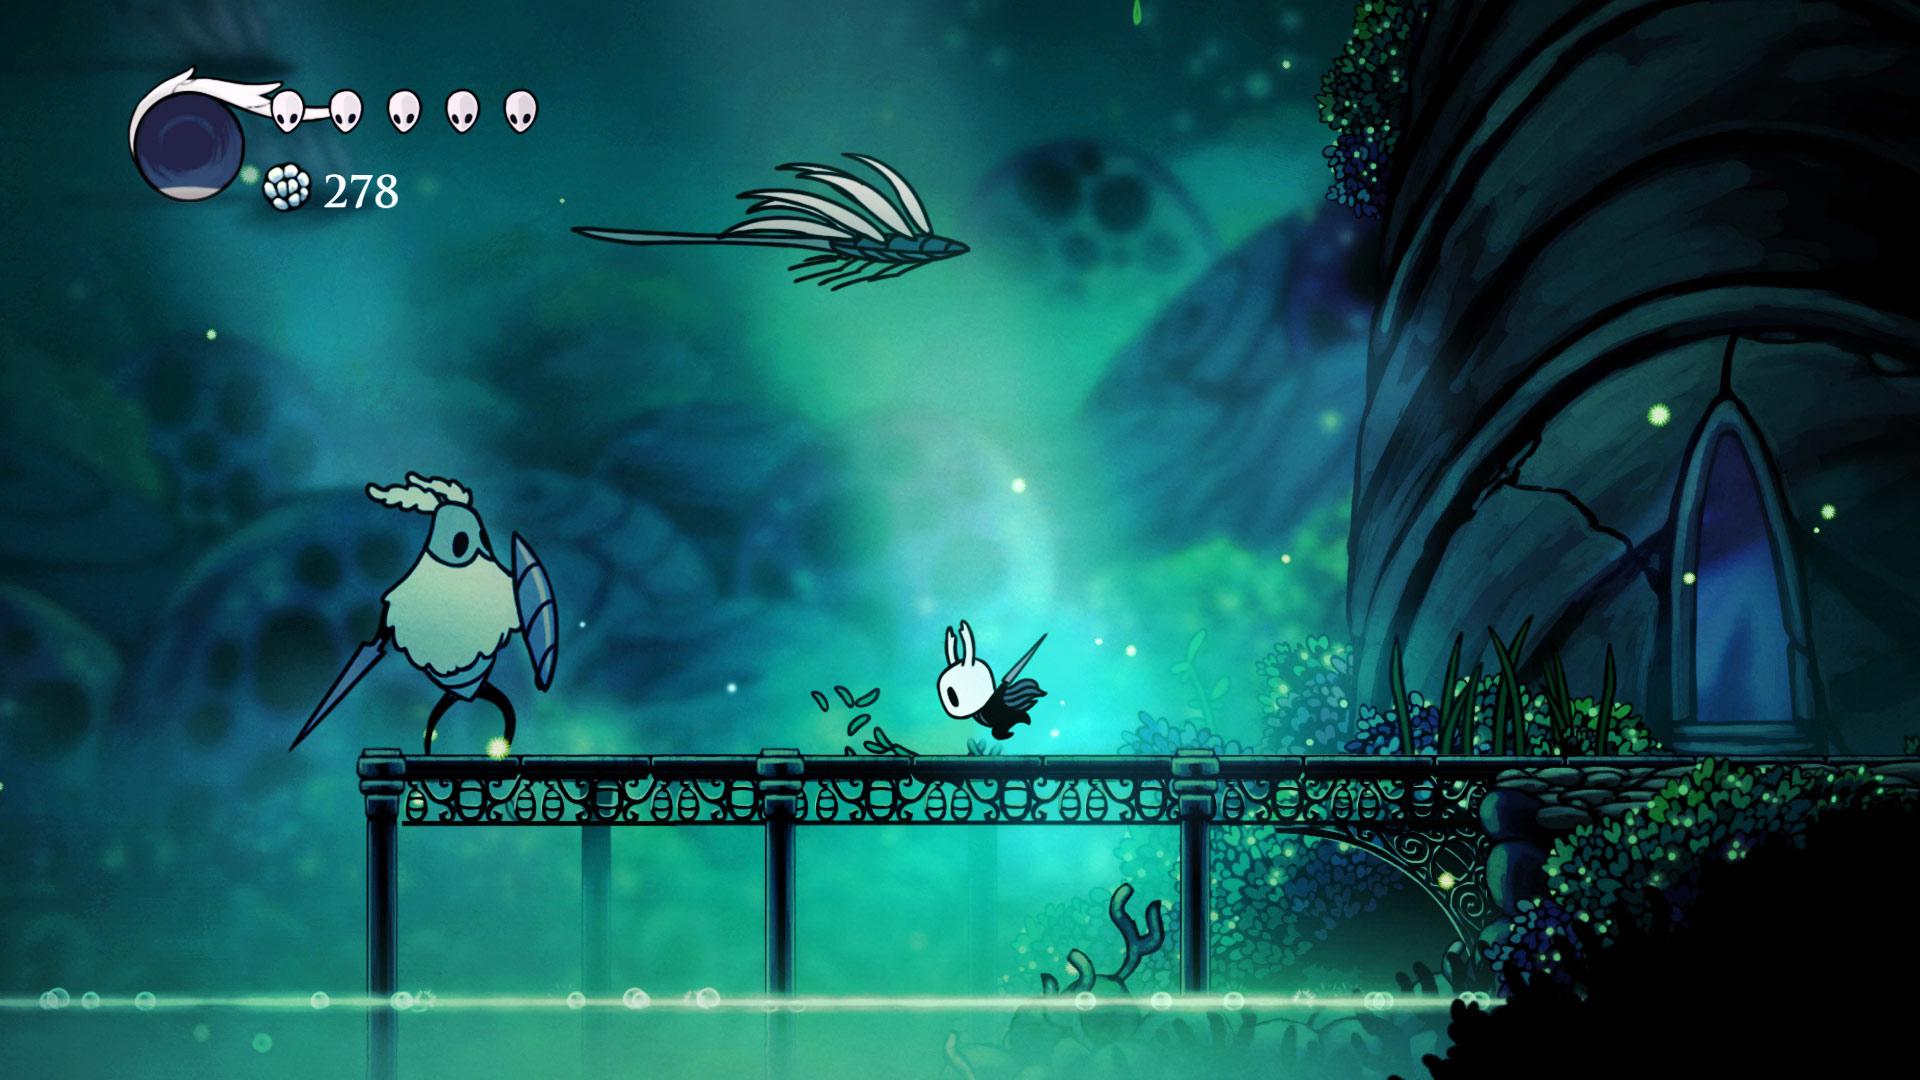 Скриншот №1 к Hollow Knight Издание «Сердце пустоты»